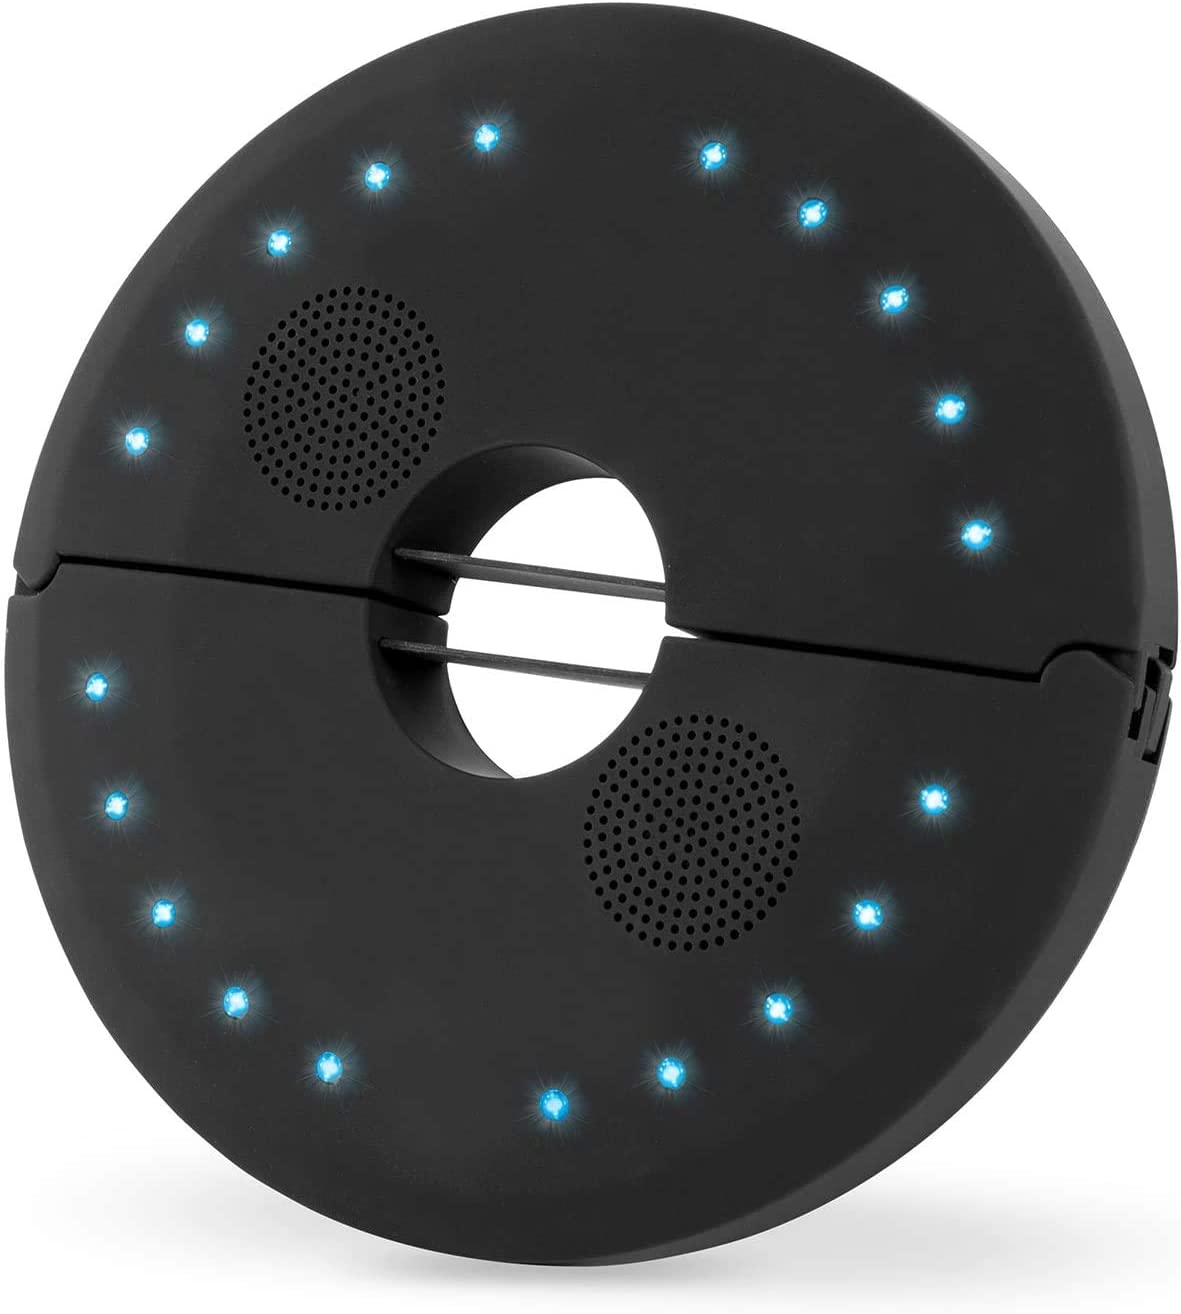 - Black 20 LED Outdoor Waterproof Umbrella Light Wireless Speaker Perfect for Garden//Camping//Tent uuffoo Patio Umbrella Lamp Speaker 5volts USB Charging 4 Lighting Modes